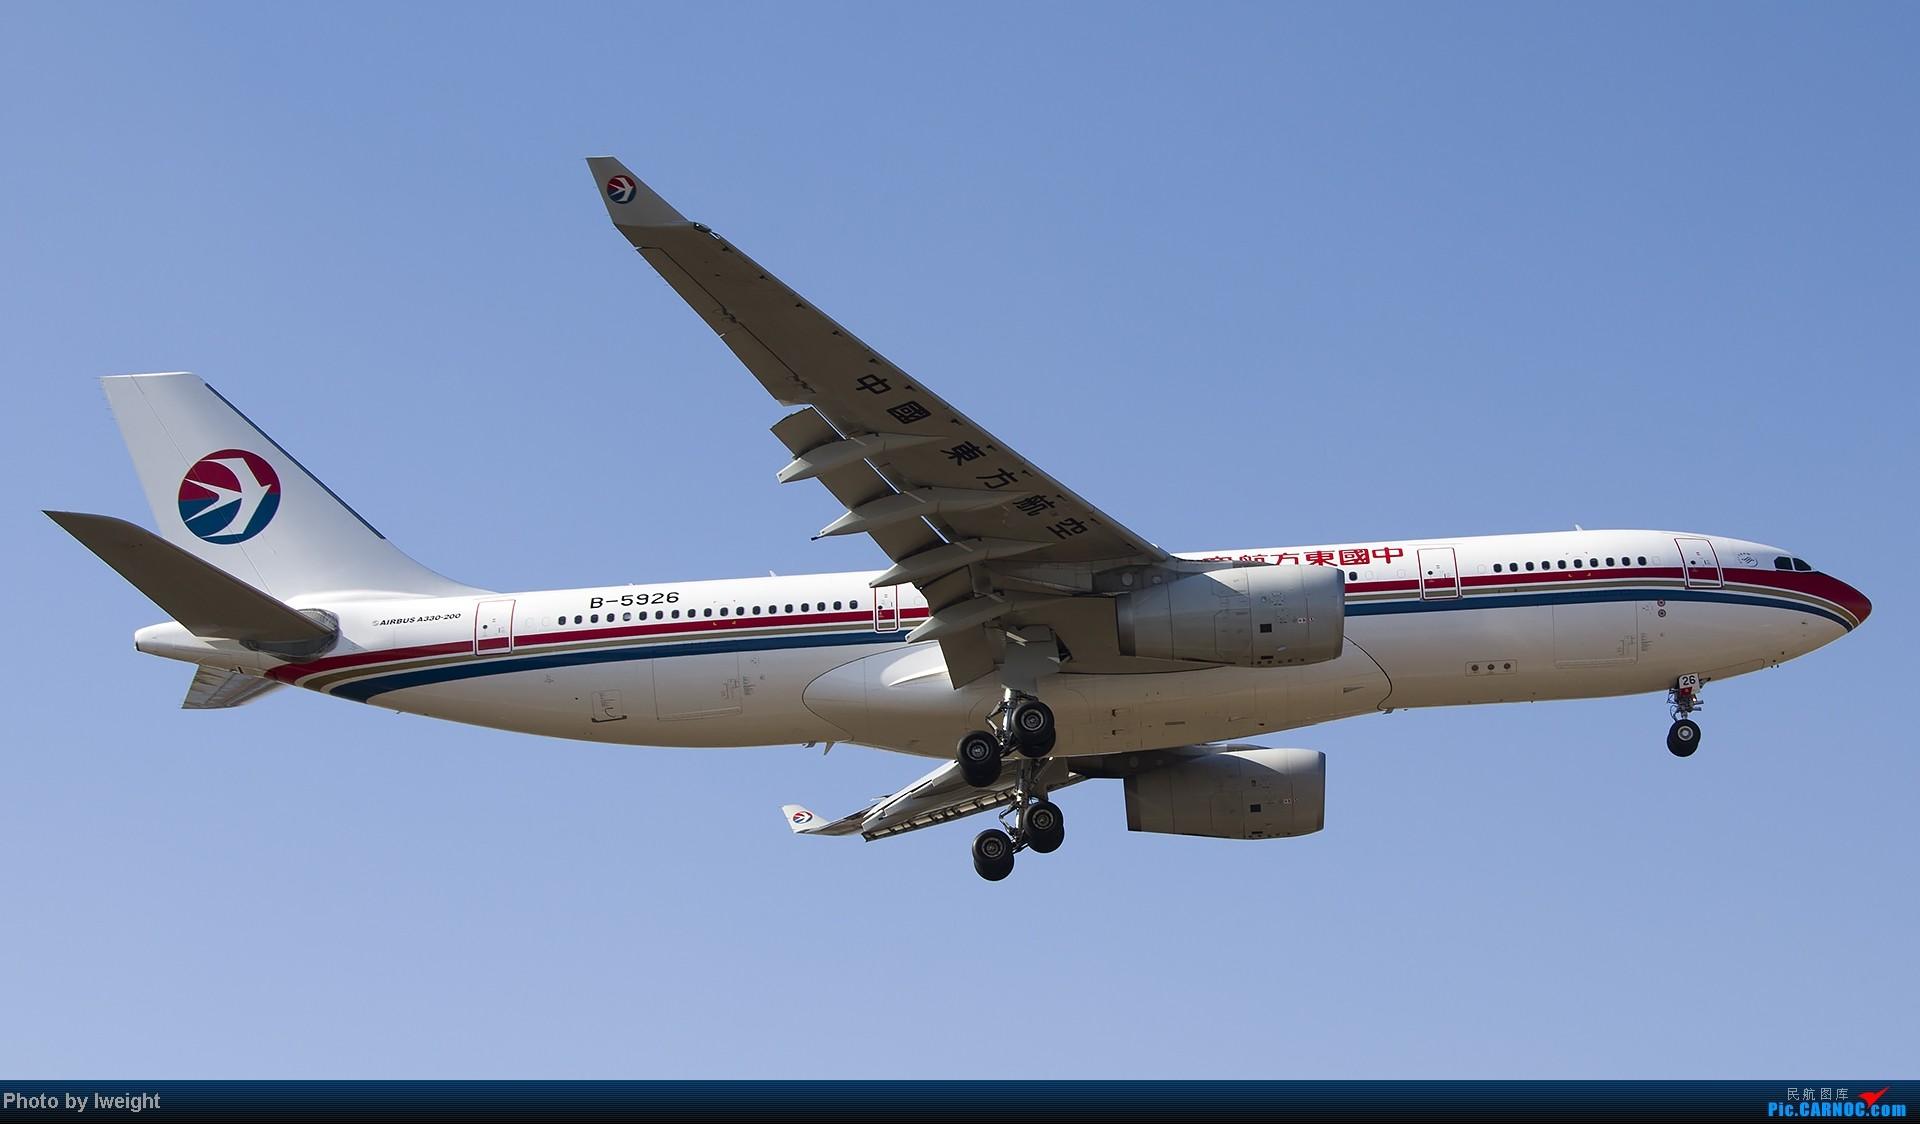 Re:[原创]抓住APEC蓝的尾巴,再拍上一组 AIRBUS A330-200 B-5926 中国北京首都机场